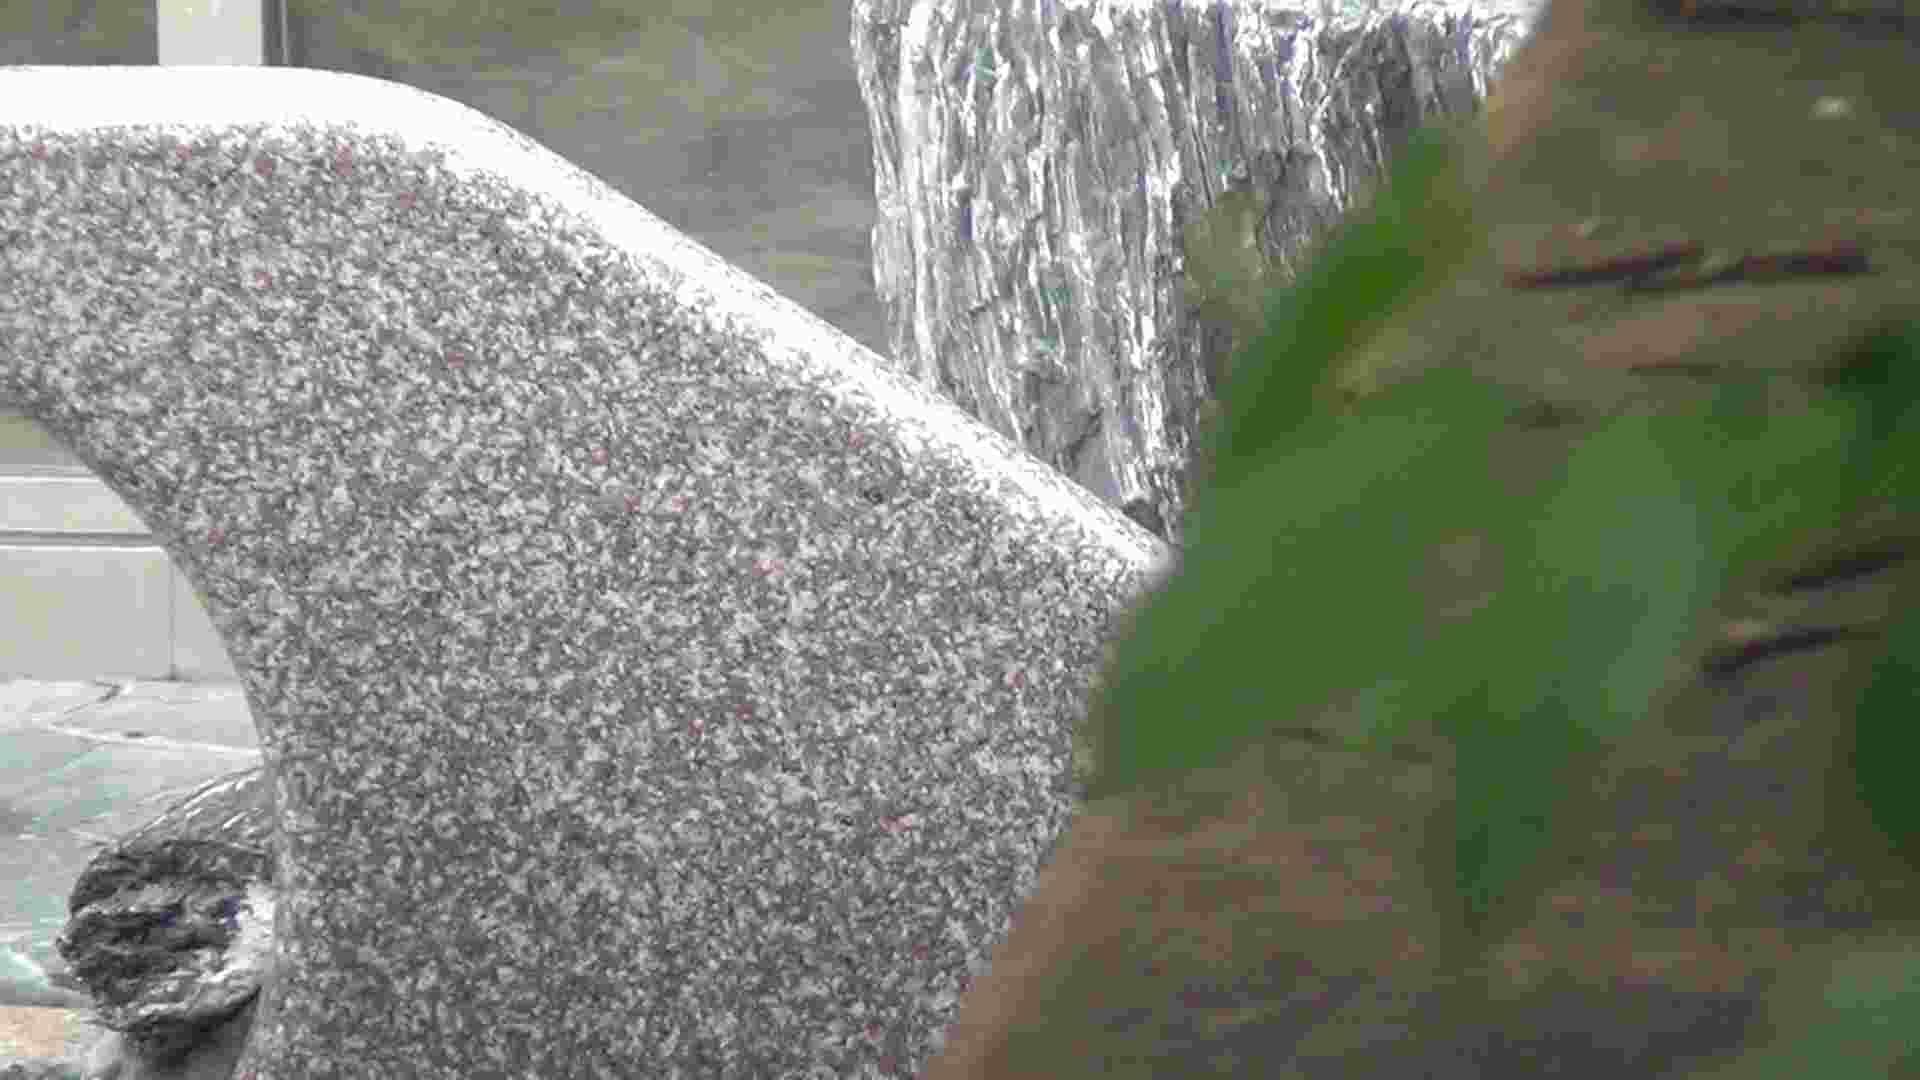 Aquaな露天風呂Vol.249 OLのエロ生活 SEX無修正画像 60連発 2